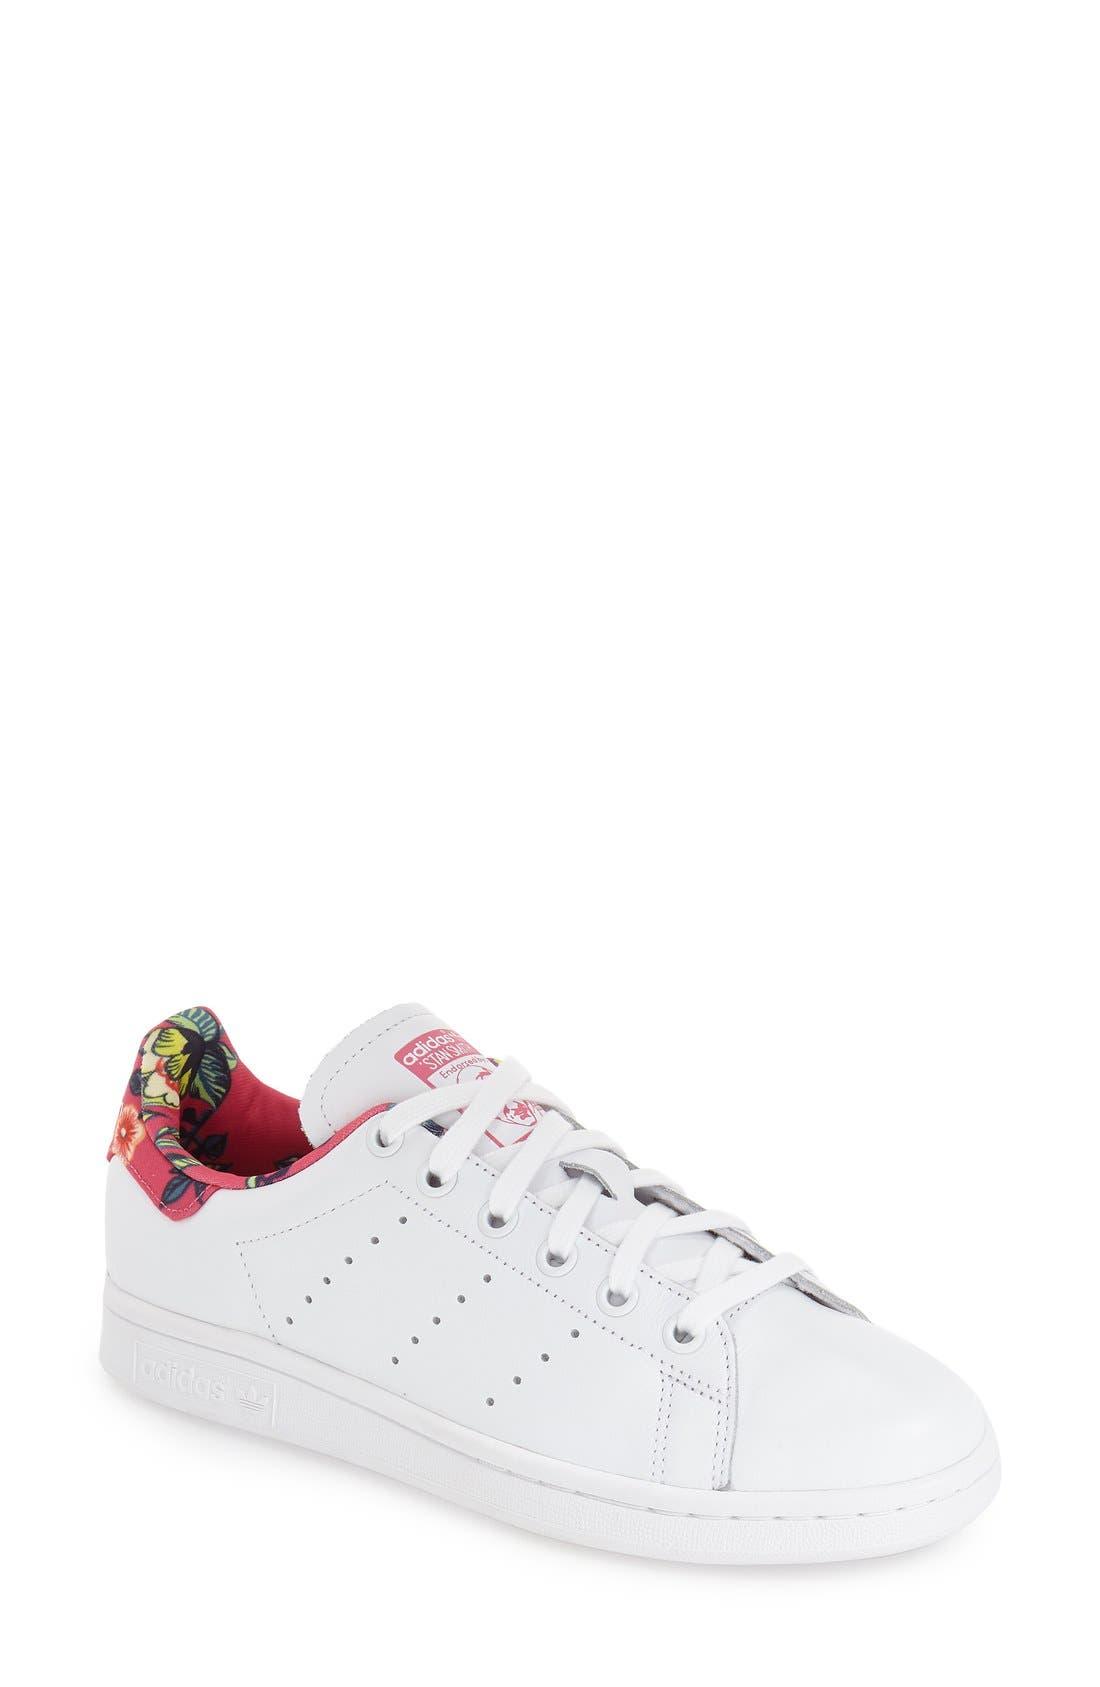 Main Image - adidas x The FARM Company \u0027Stan Smith\u0027 Sneaker (Women)